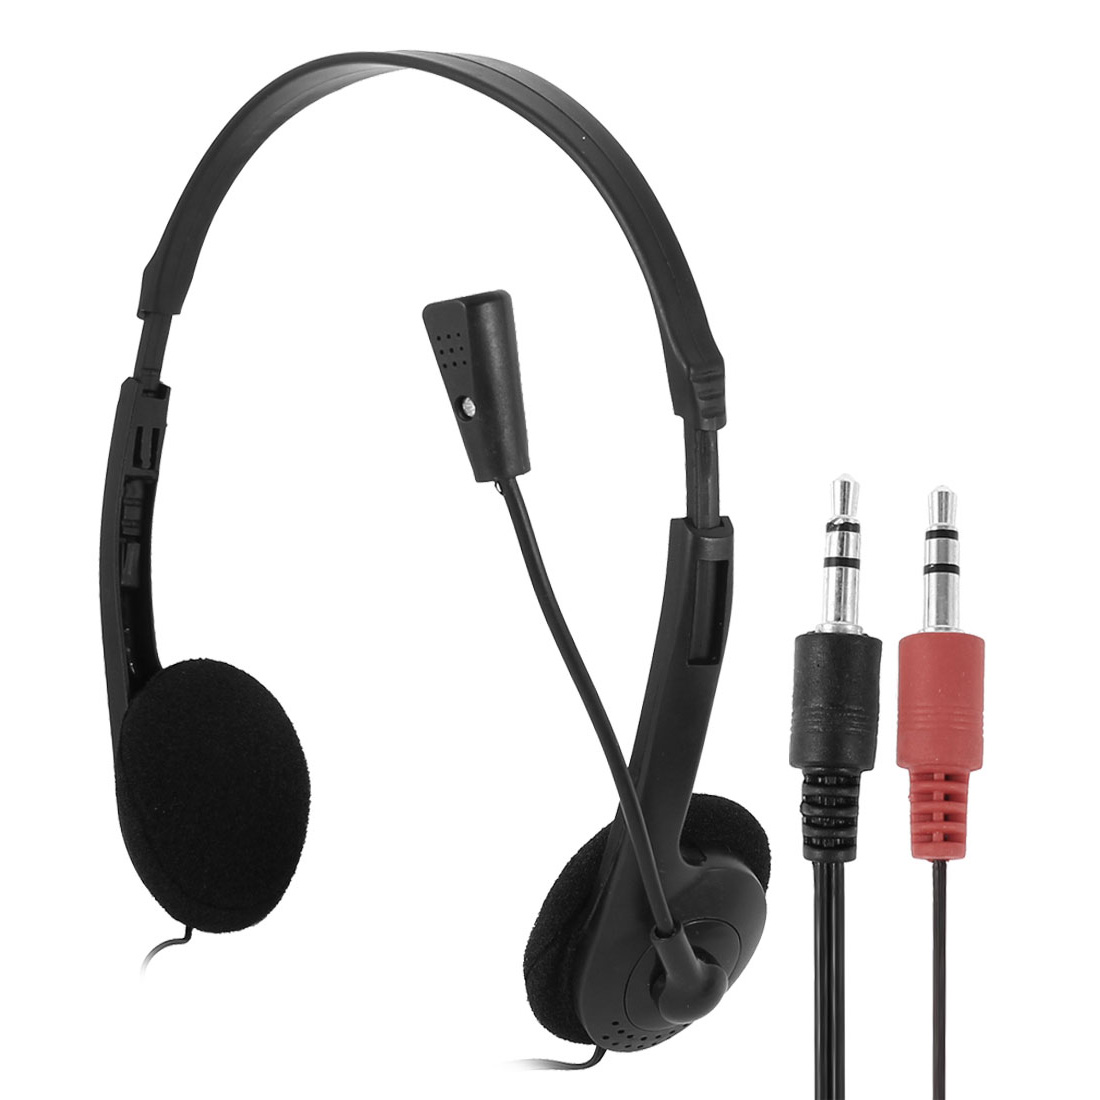 3.5mm Adjustable Head Band Sponge Ear Pad Microphone Headphone Earhone Black